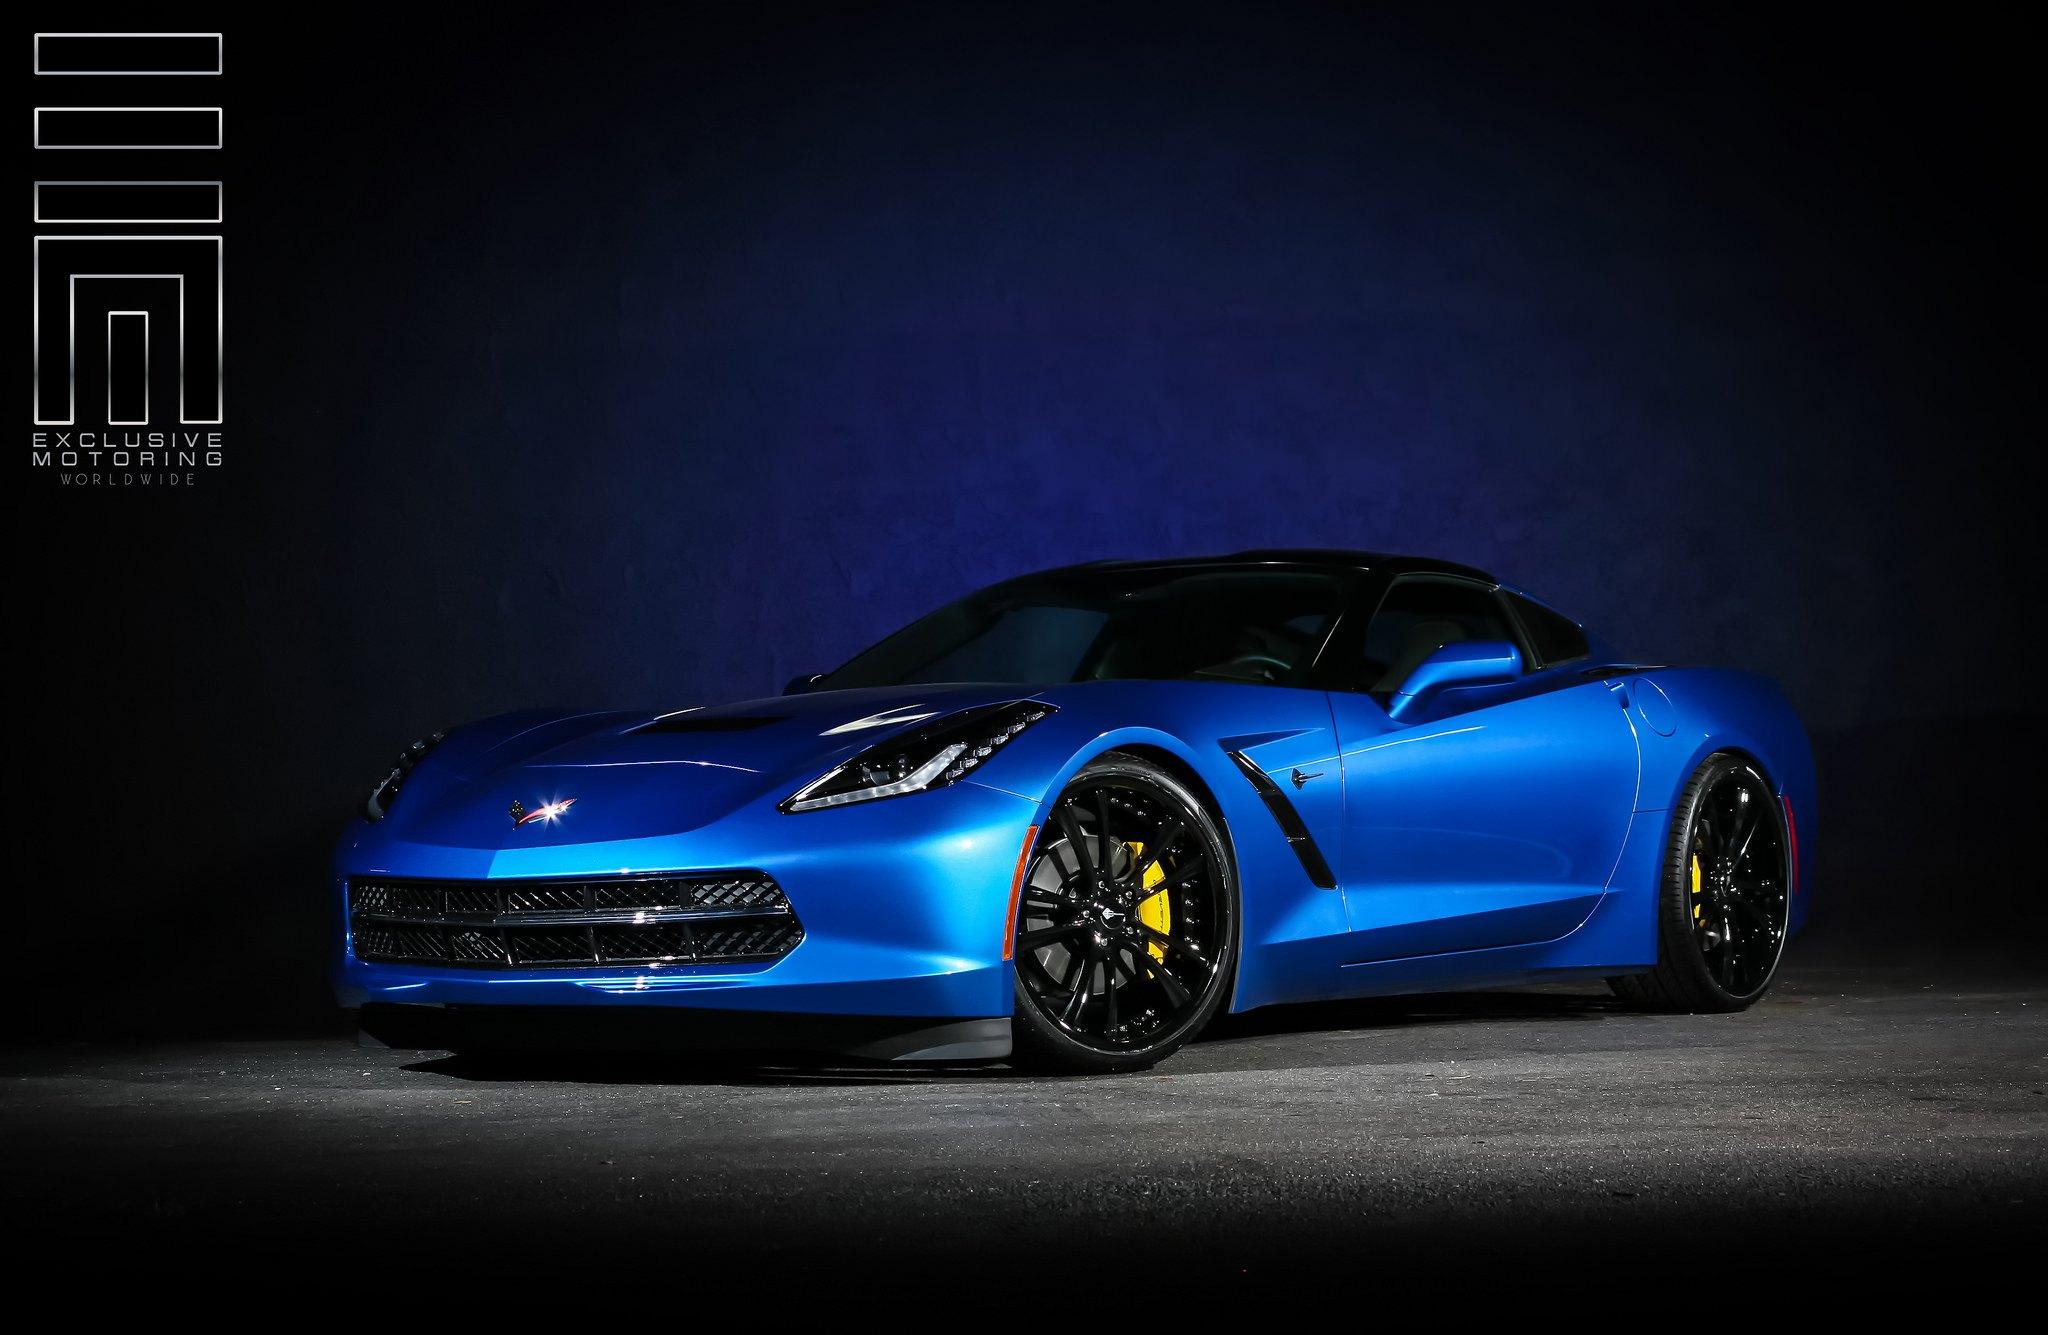 Electric Blue Corvette C7 On Black Rims Photo By Exclusive Motoring